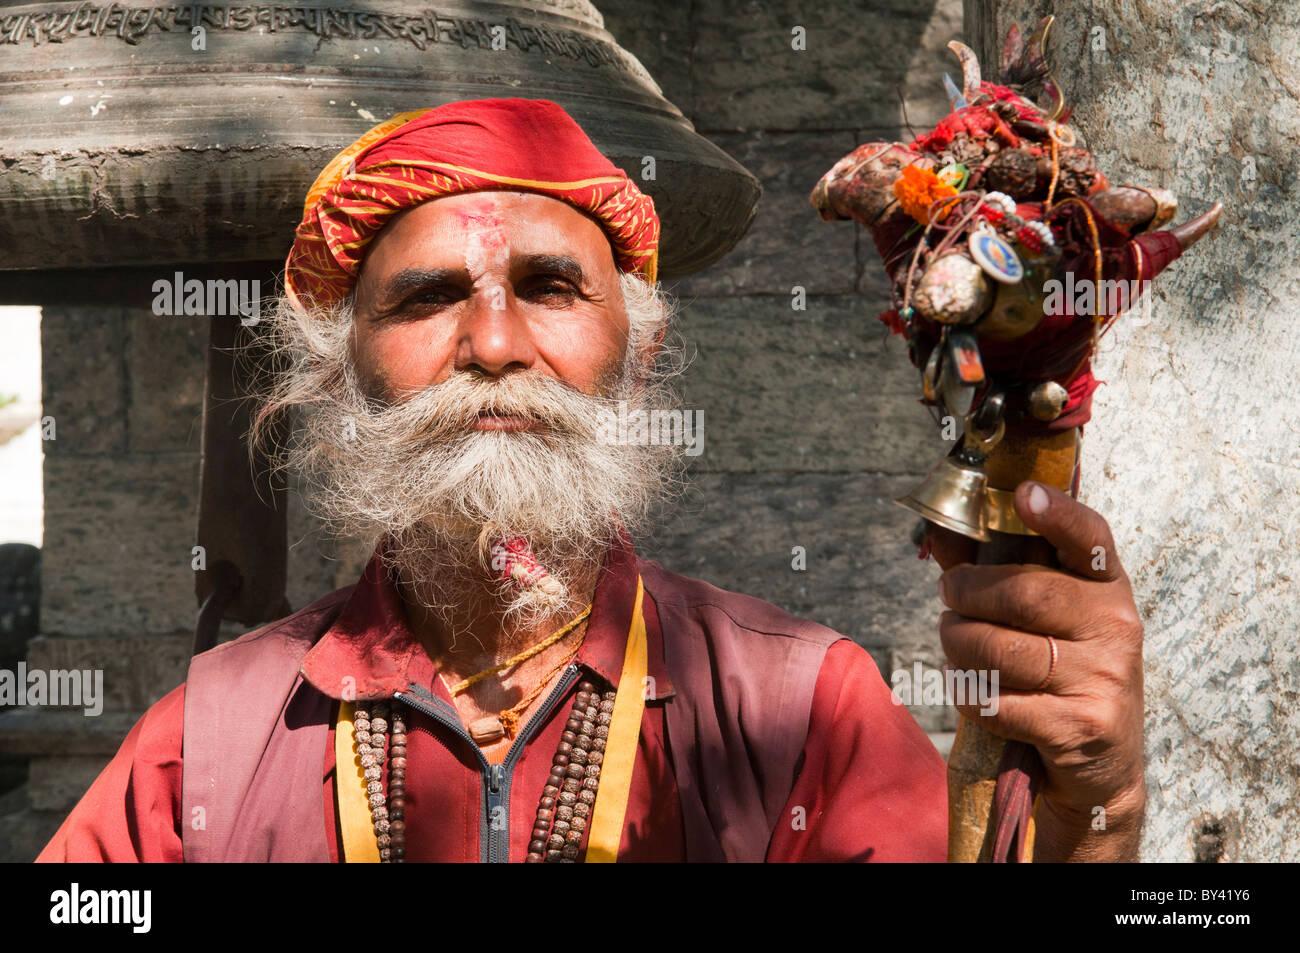 portrait of a sadhu at the Pashupatinath Temple in Kathmandu, Nepal Stock Photo